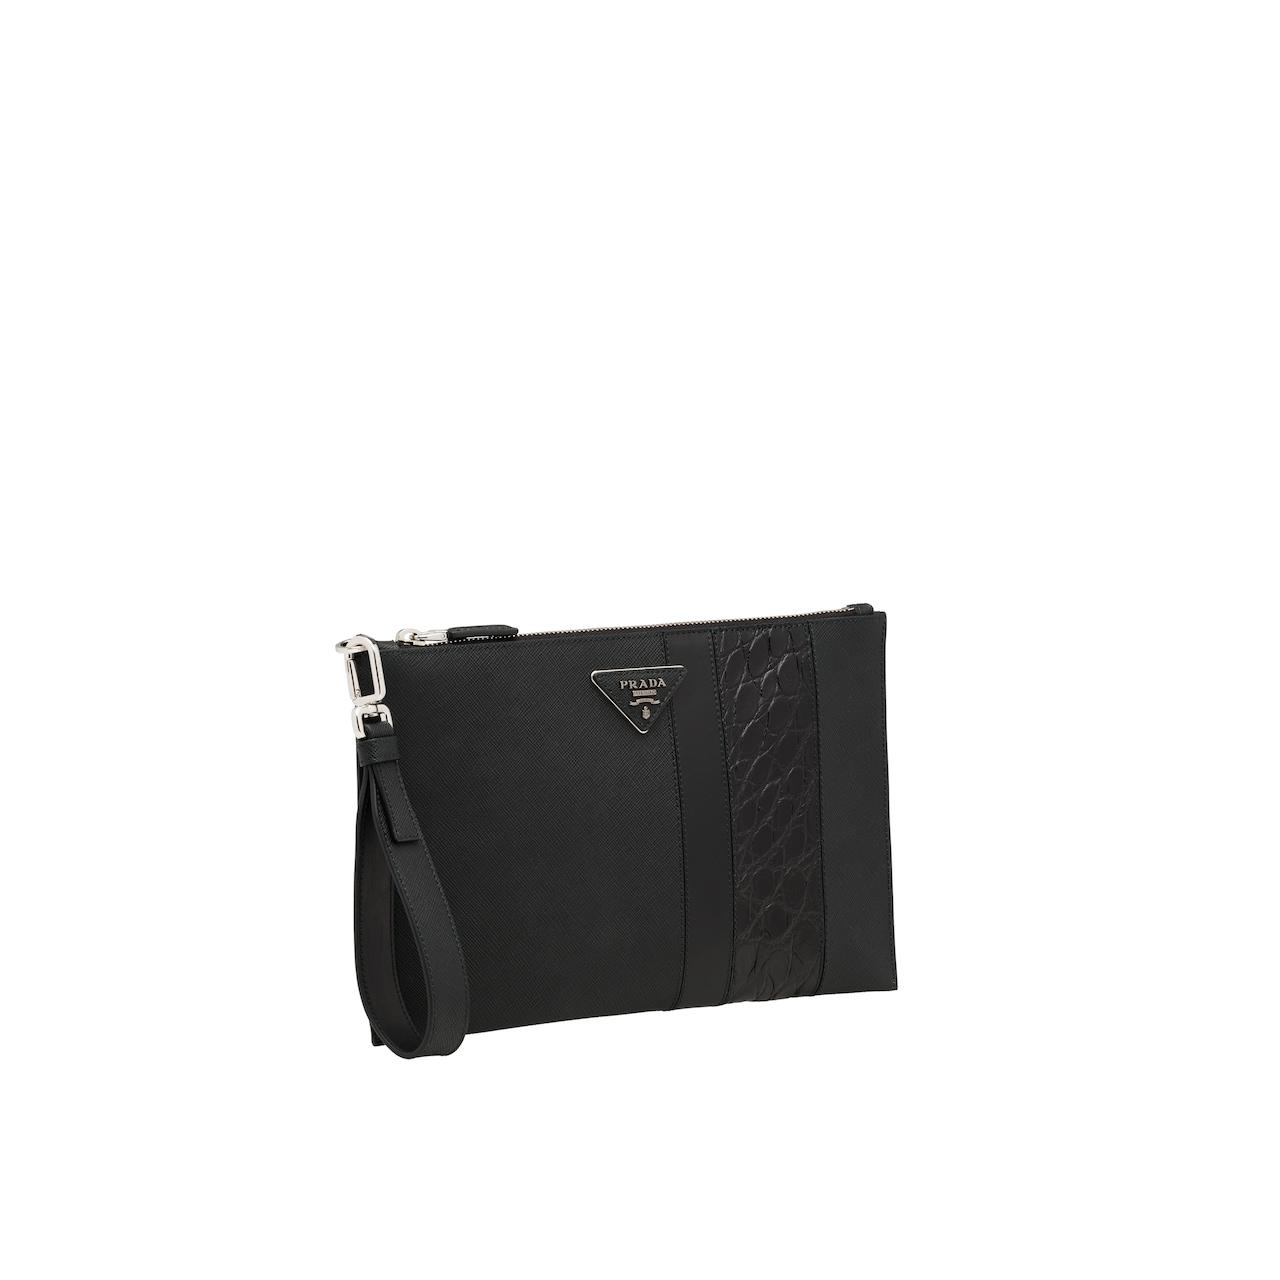 Prada Saffiano leather pouch 4